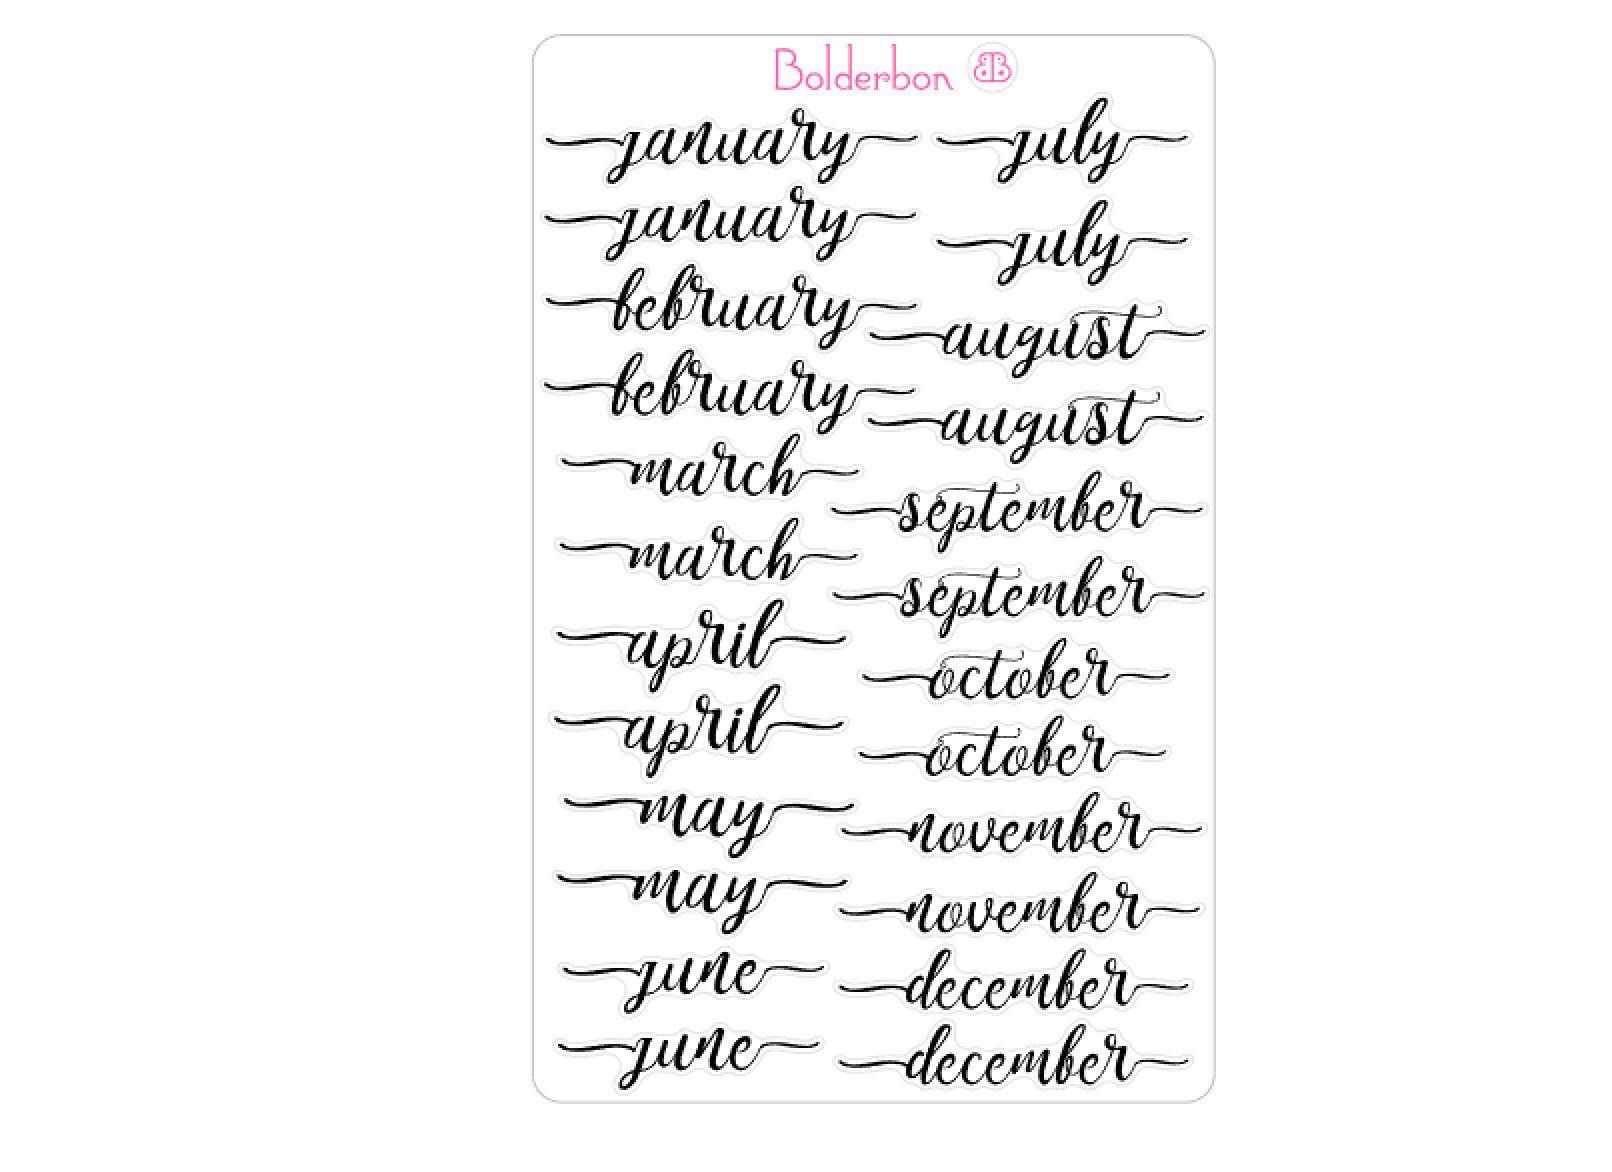 Month Stickers Bullet Journal Script Vinyl Bujo Stickers Monthly Planner Handlettering Brush Lettering Calendar Cursive In 2020 Lettering Journal Stickers Bullet Journal Stickers